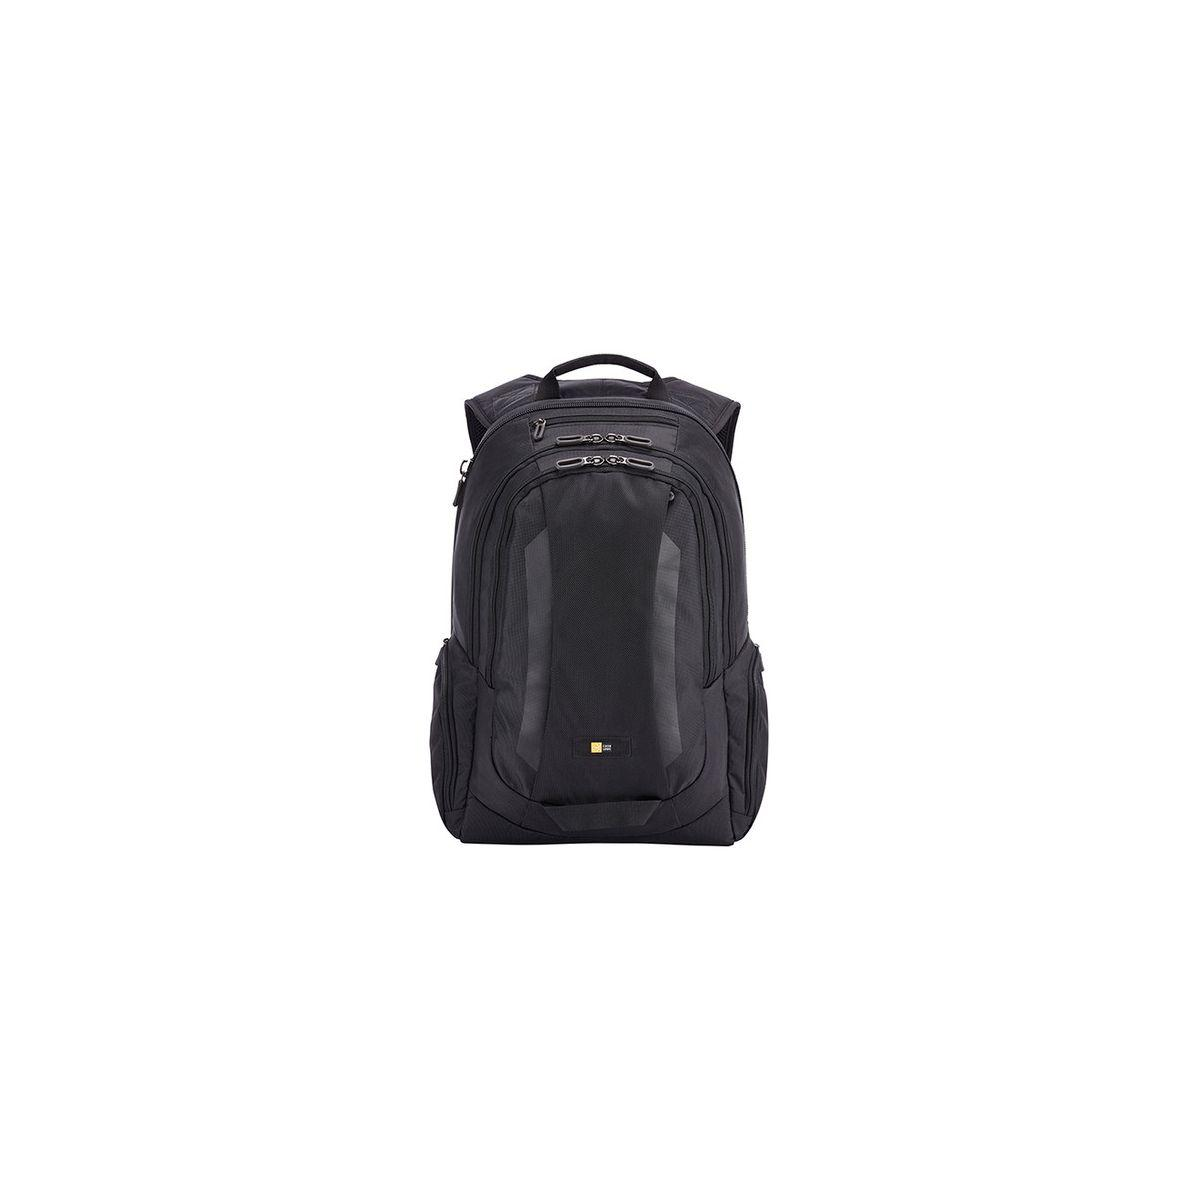 Sac � dos caselogic professional backpack 15,6'' noir - livraison offerte : code premium